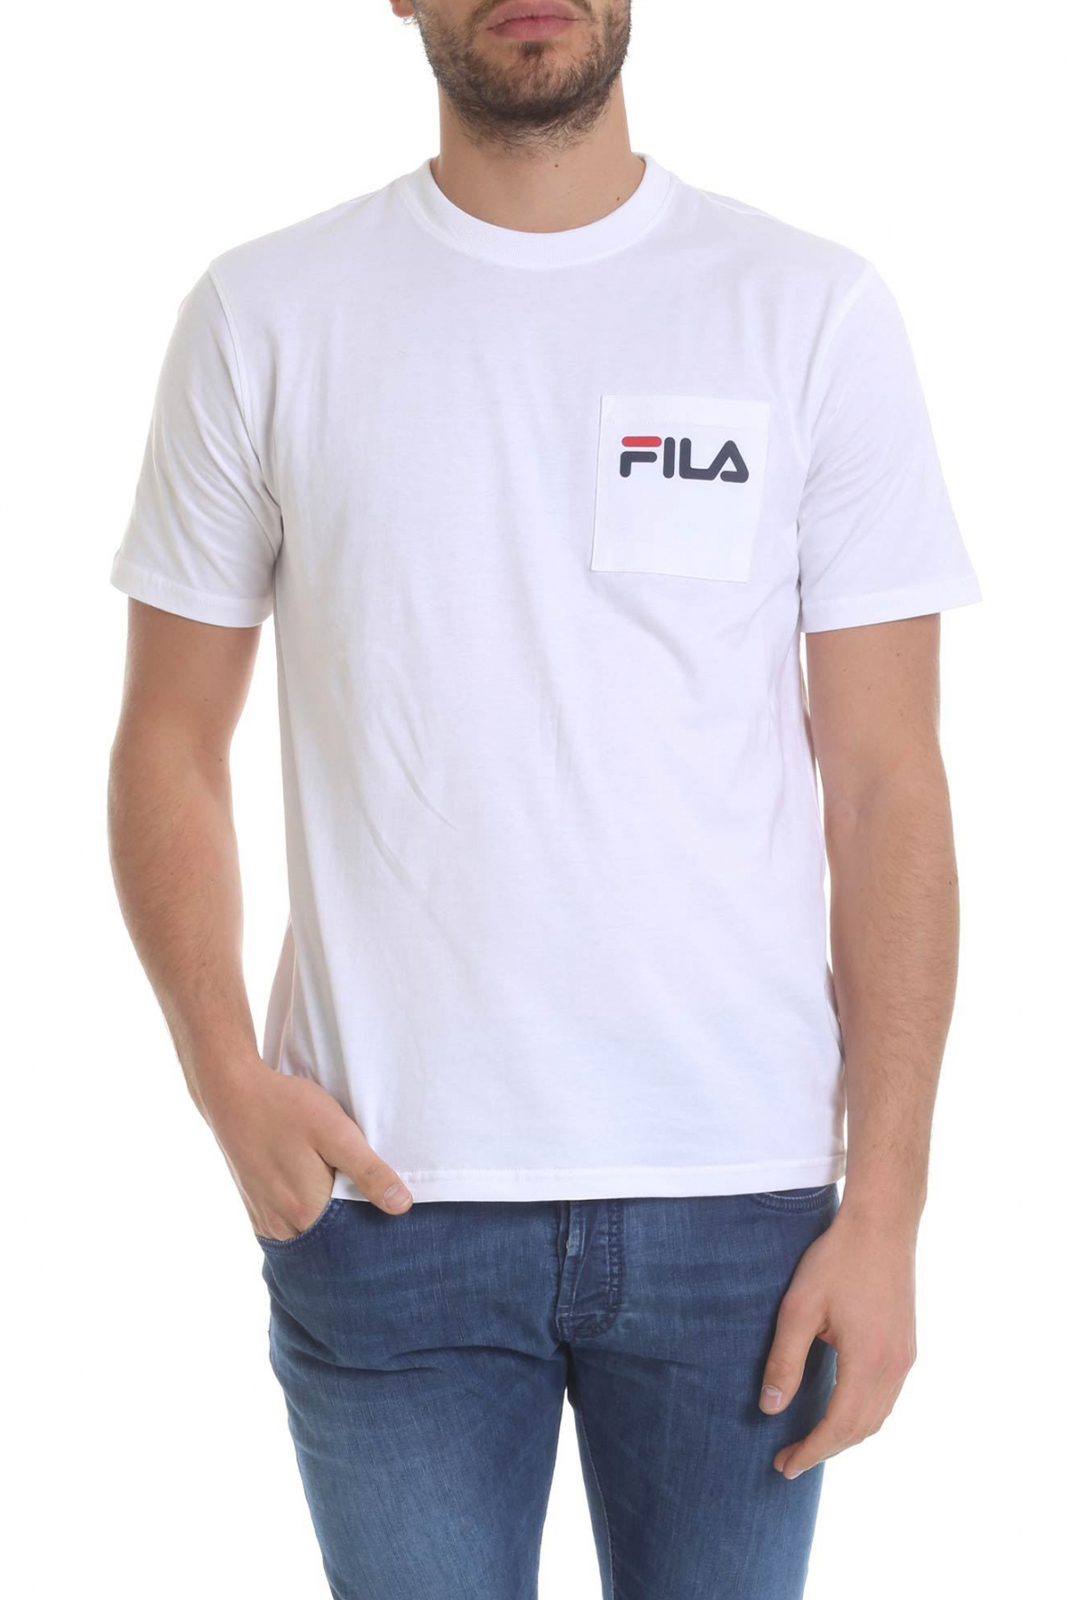 Tee-shirts  Fila 684472 curtis 1 WHITE